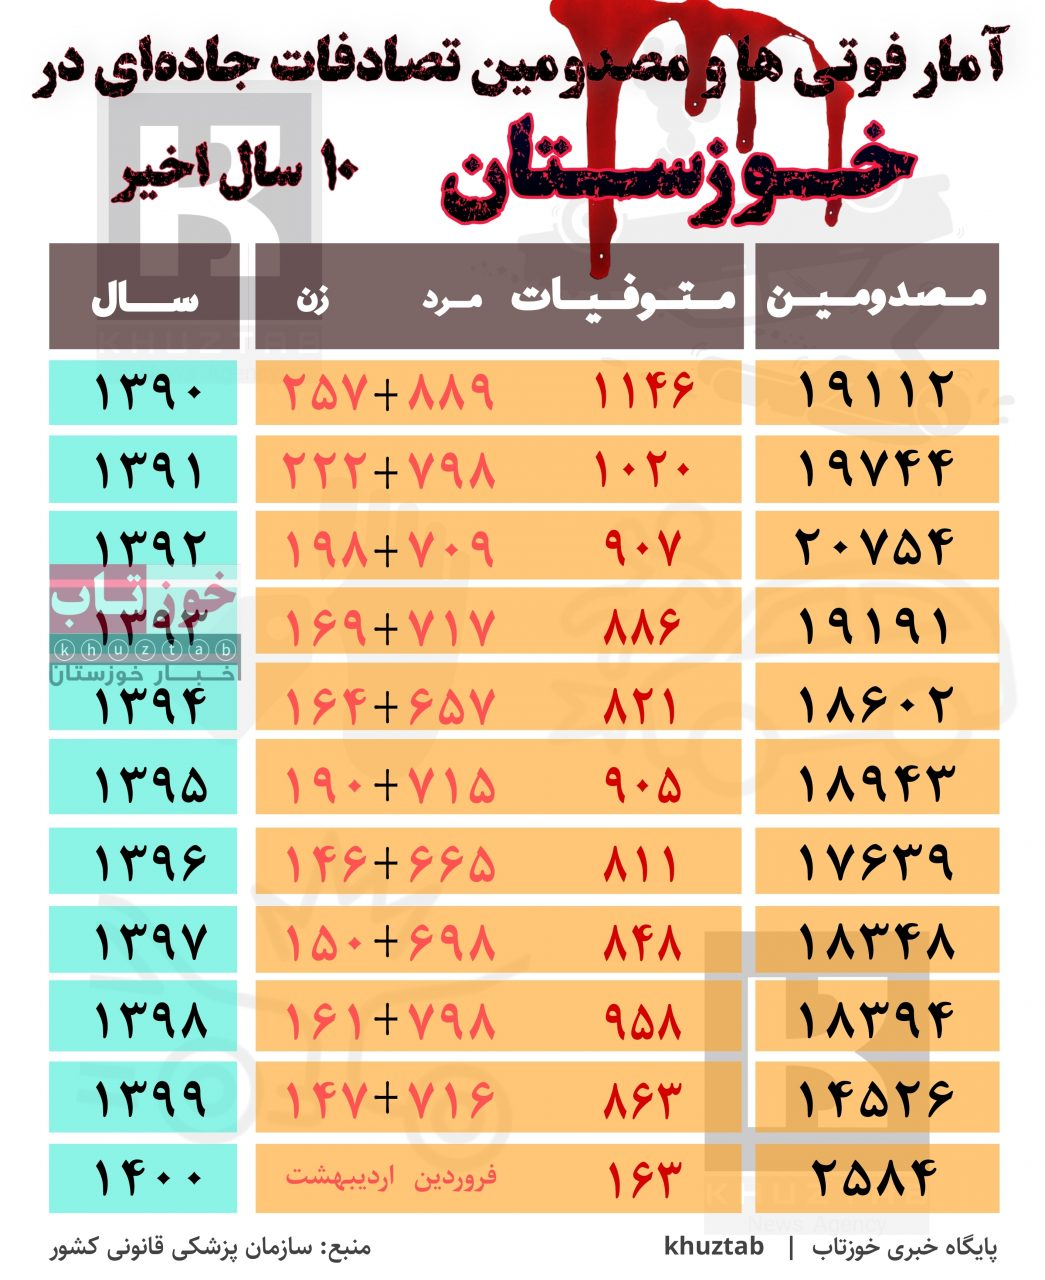 PicsArt 07 17 05.51.25 1045x1280 آمار فوتی ها و مصدومین تصادفات جاده ای در خوزستان